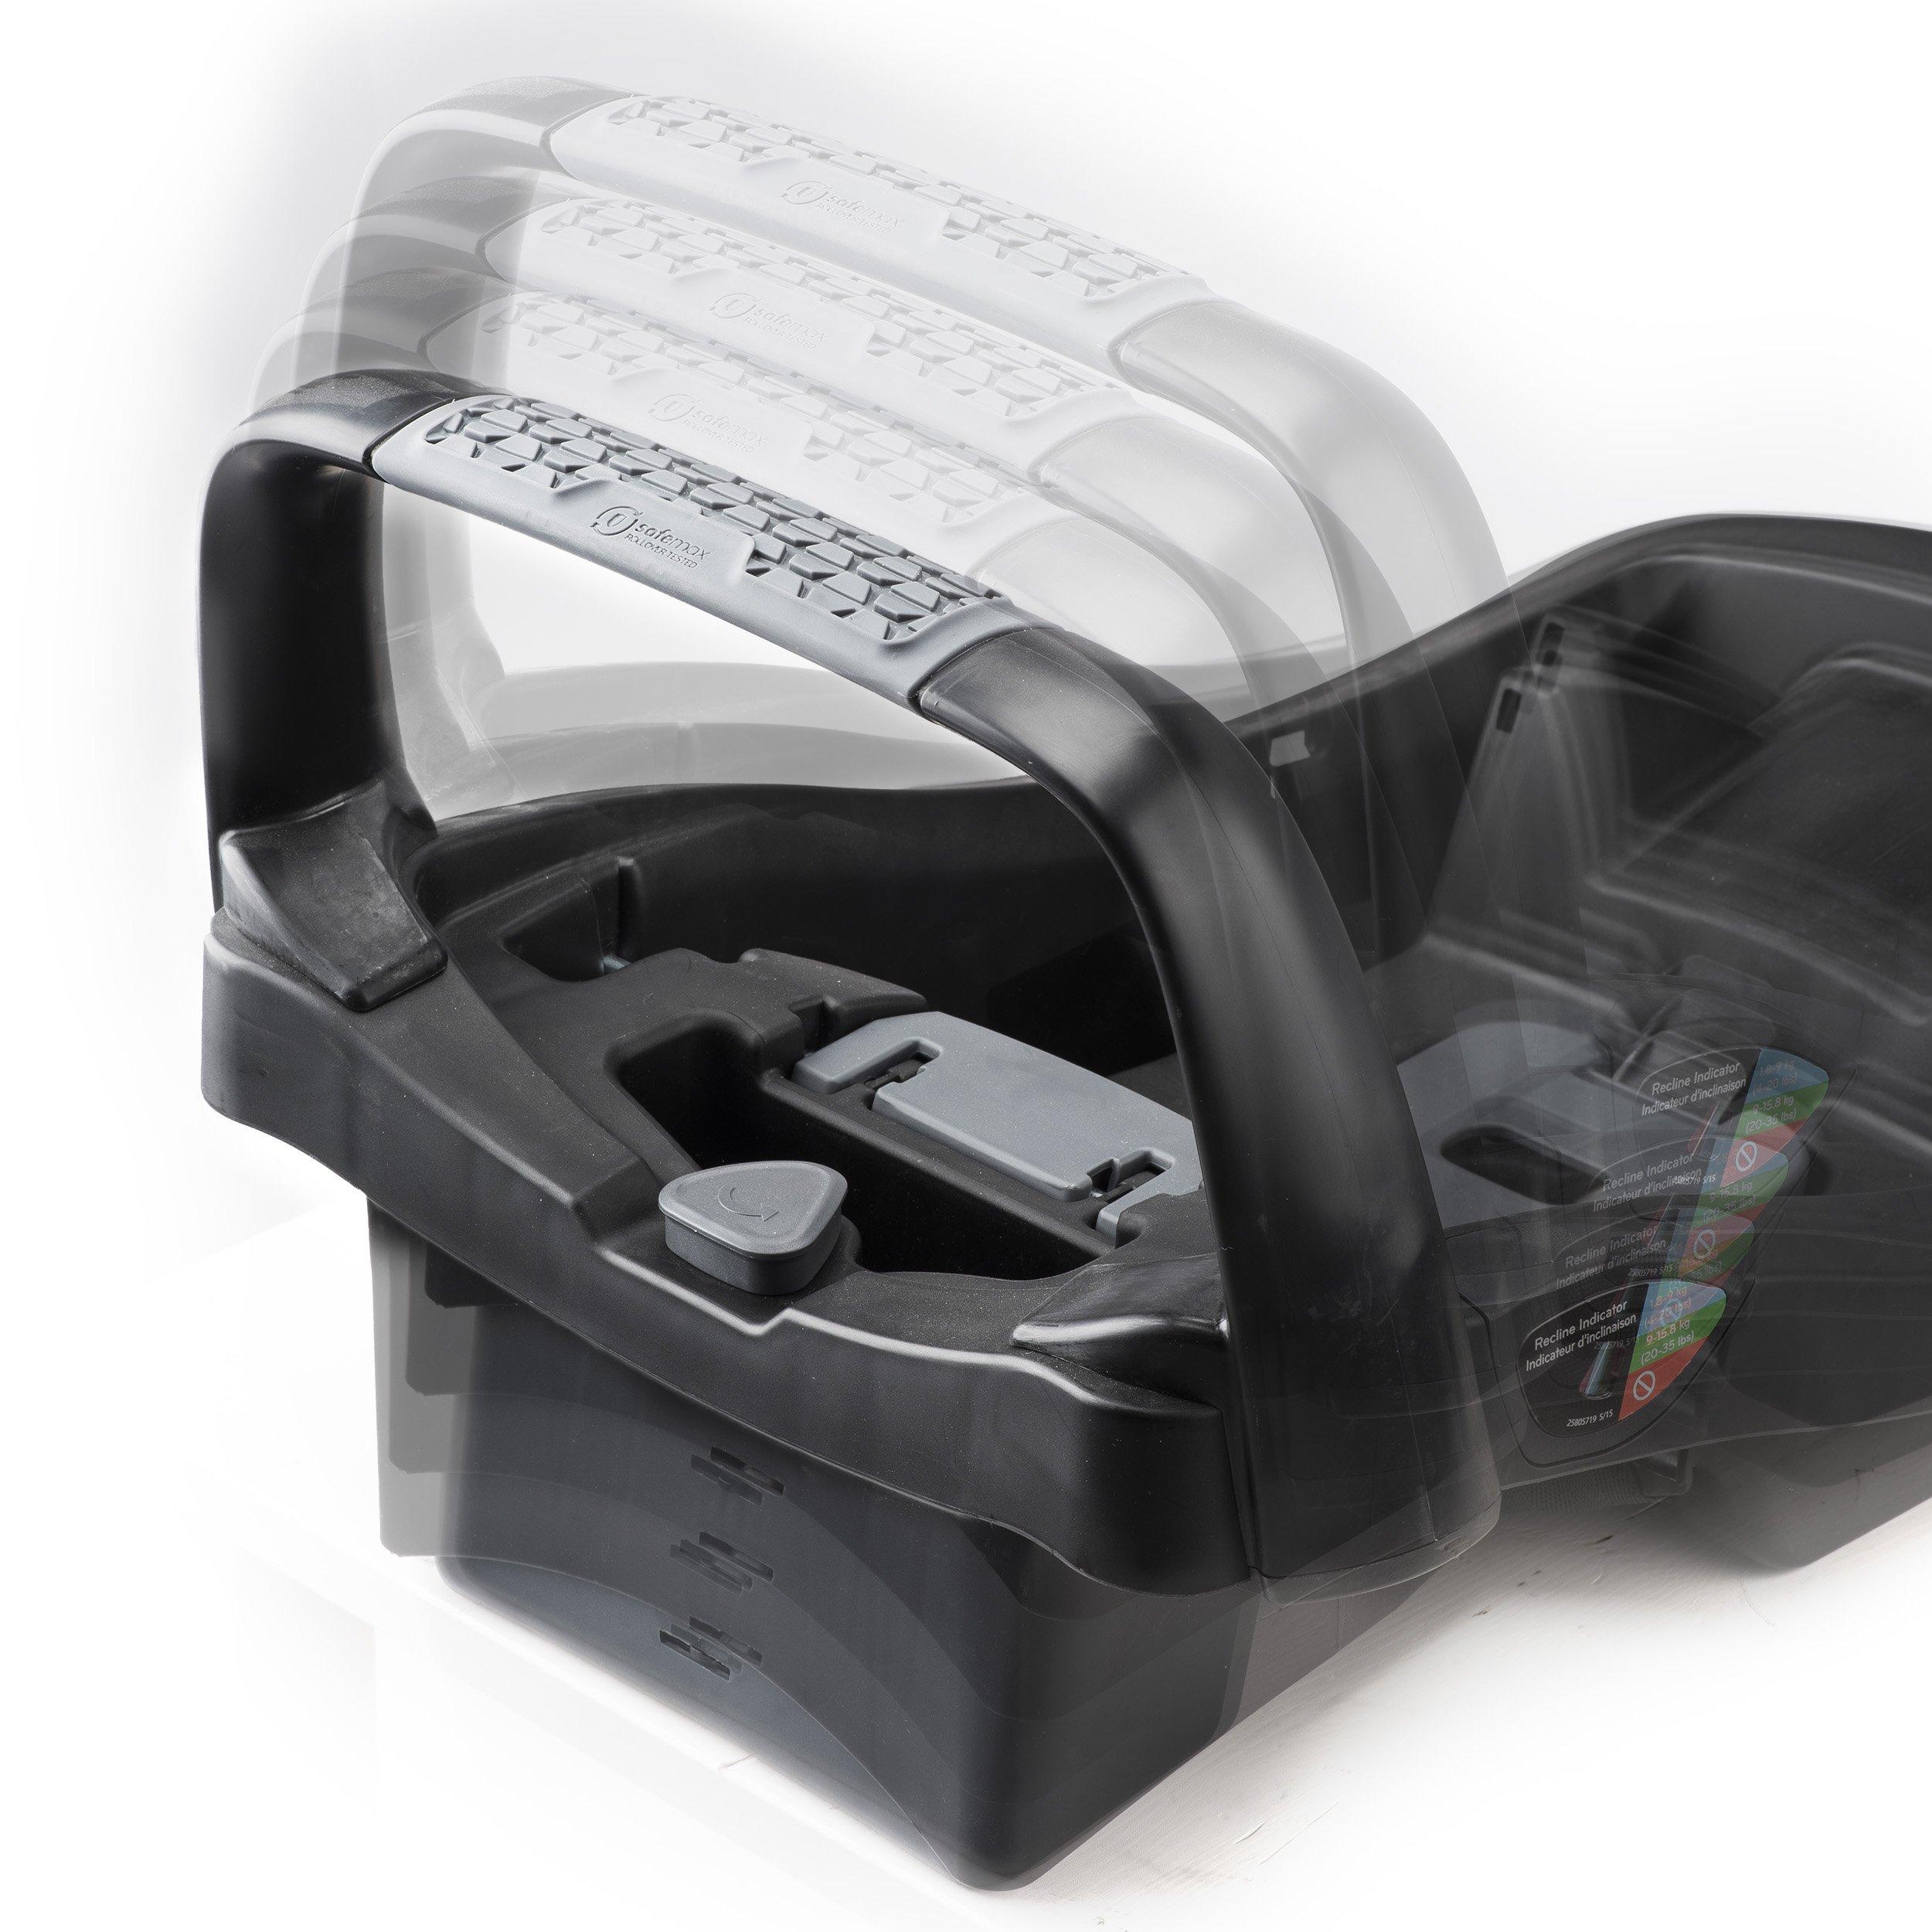 Evenflo SafeZone Base for SafeMax Infant Car Seat by Evenflo (Image #5)